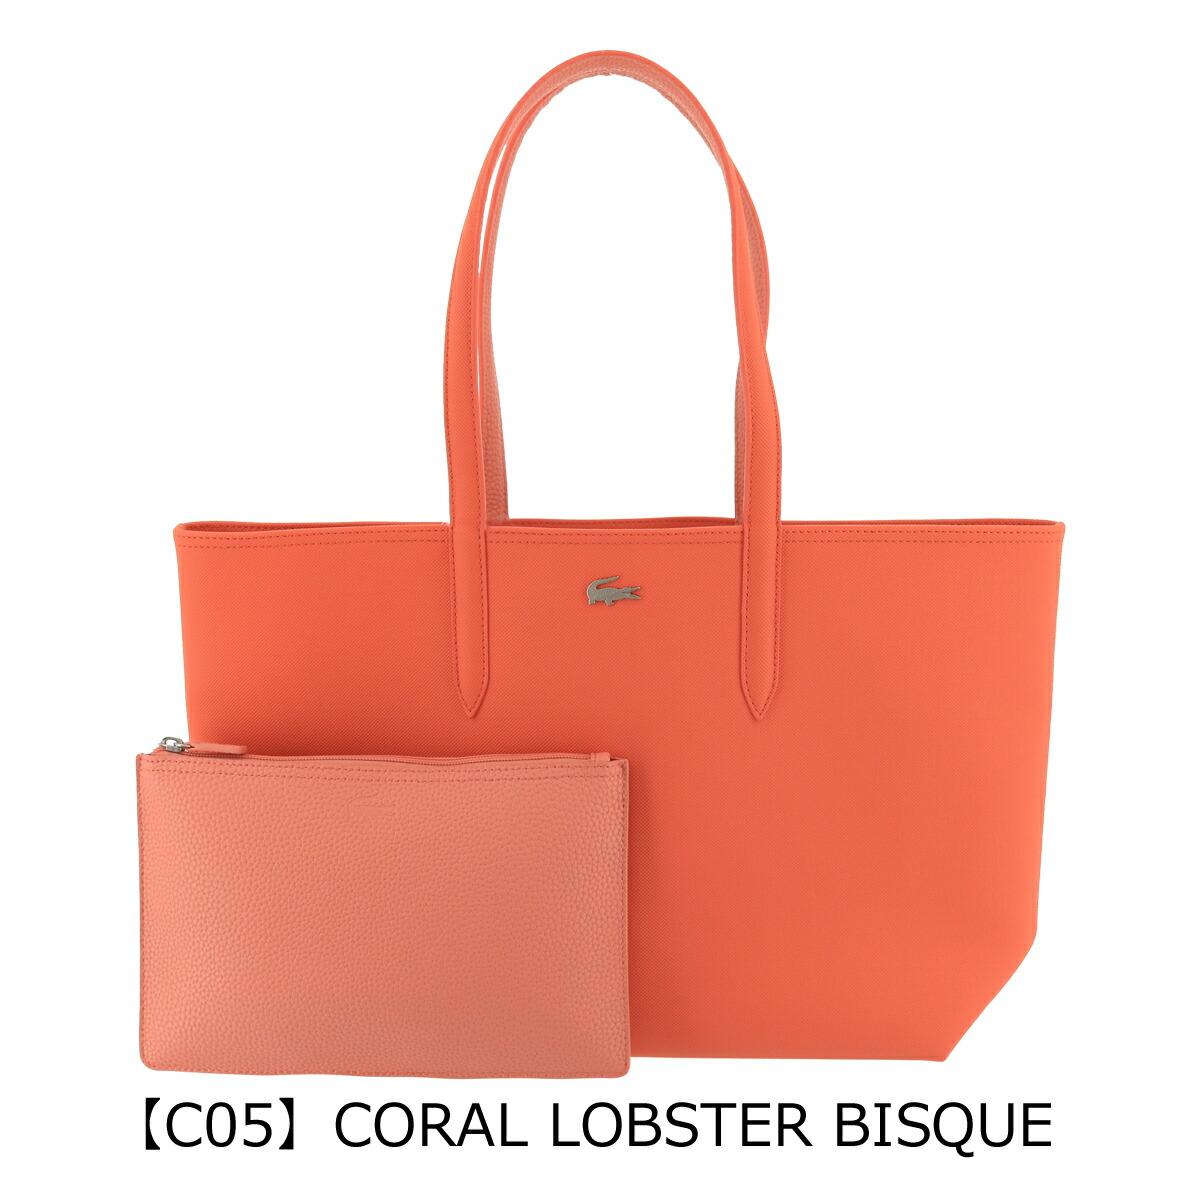 【C05】CORAL LOBSTER BISQUE